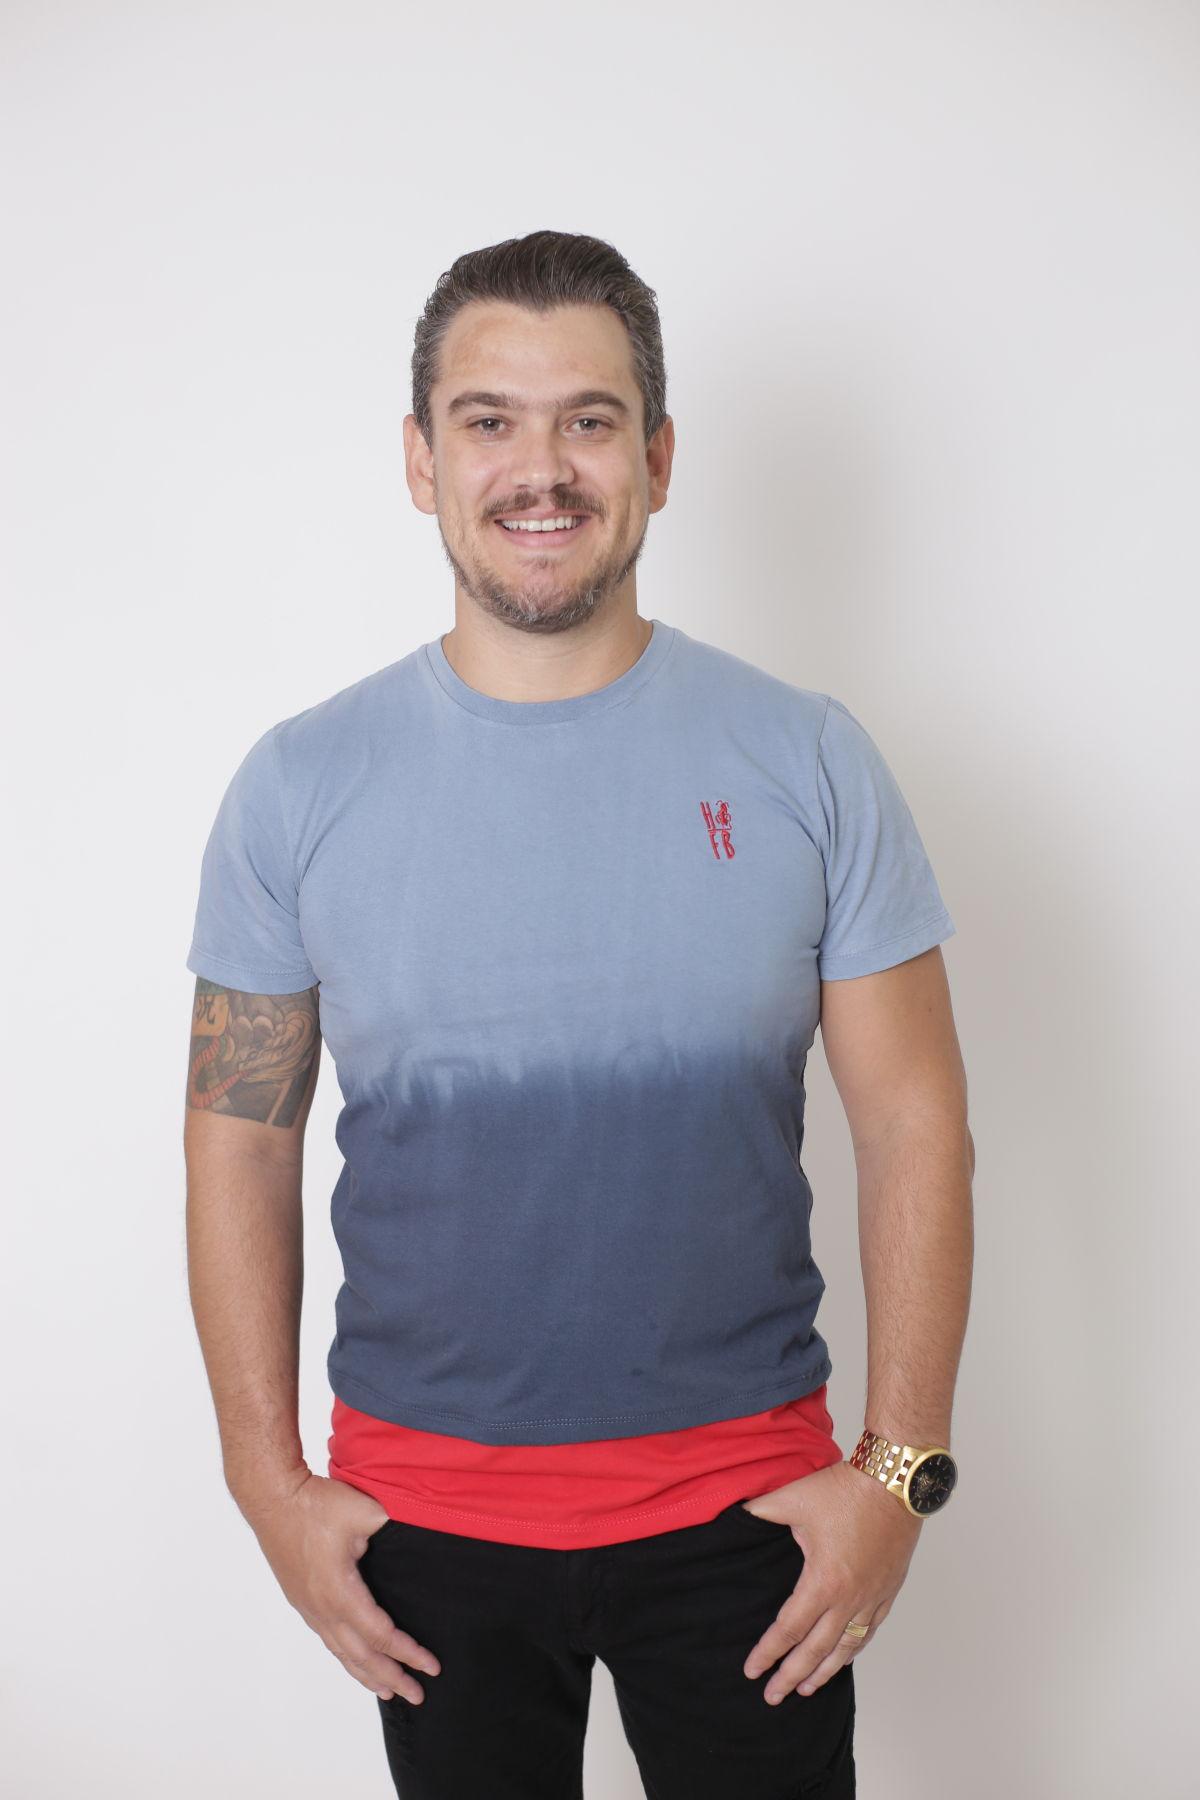 PAI E FILHO > 02 T-Shirts - Degradê [Coleção Tal Pai Tal Filho]  - Heitor Fashion Brazil